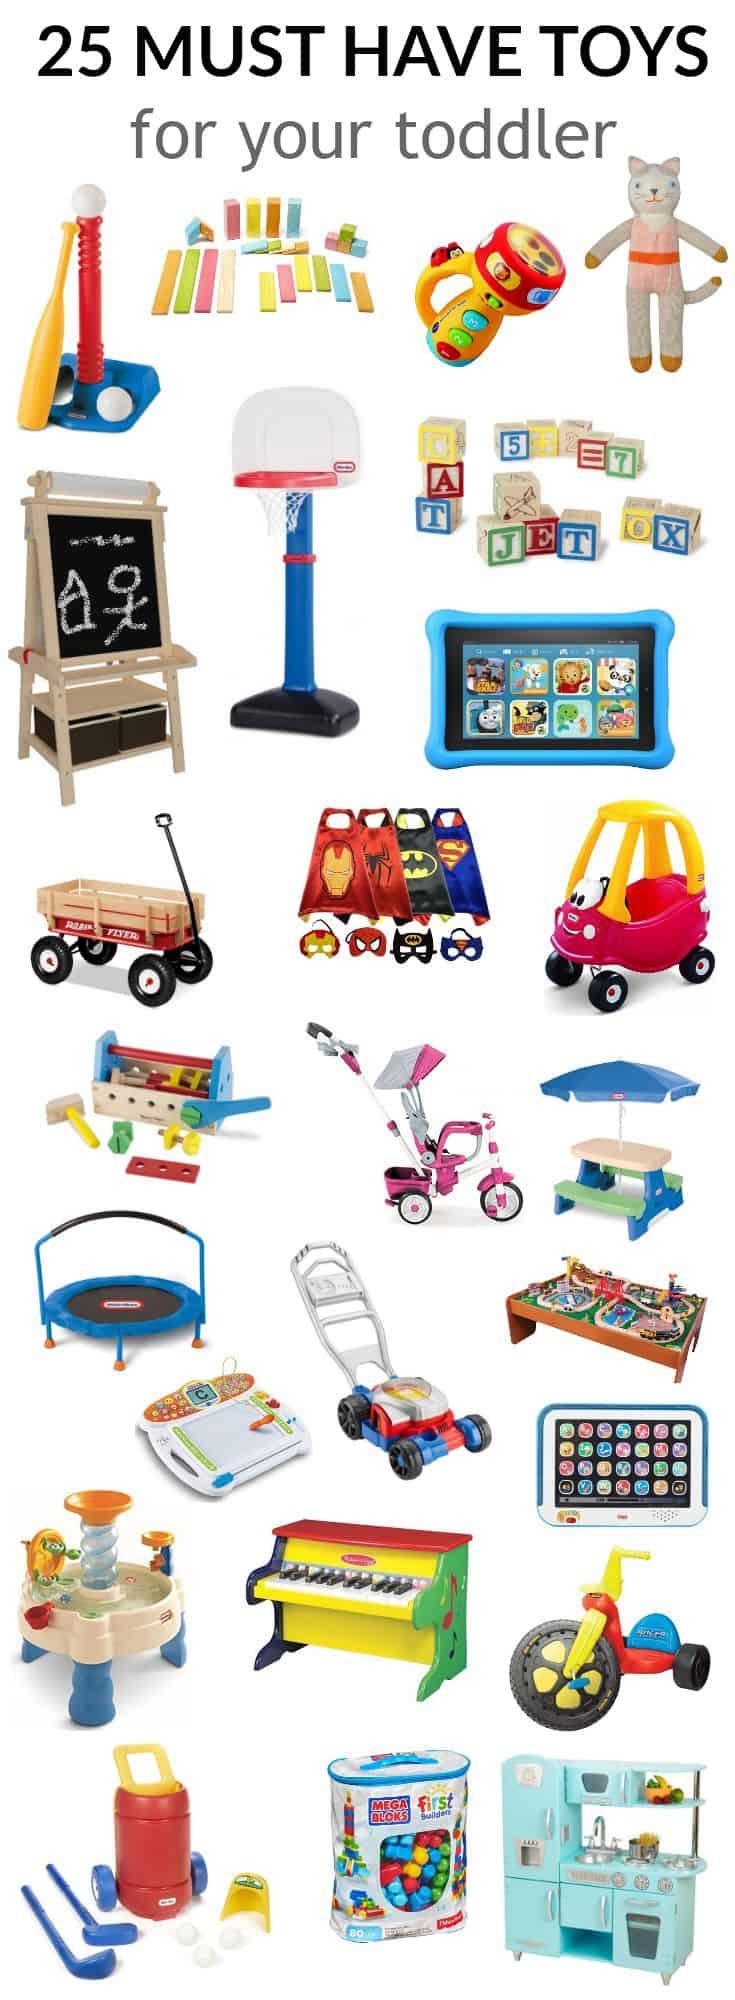 Best Toddler Toys For Christmas